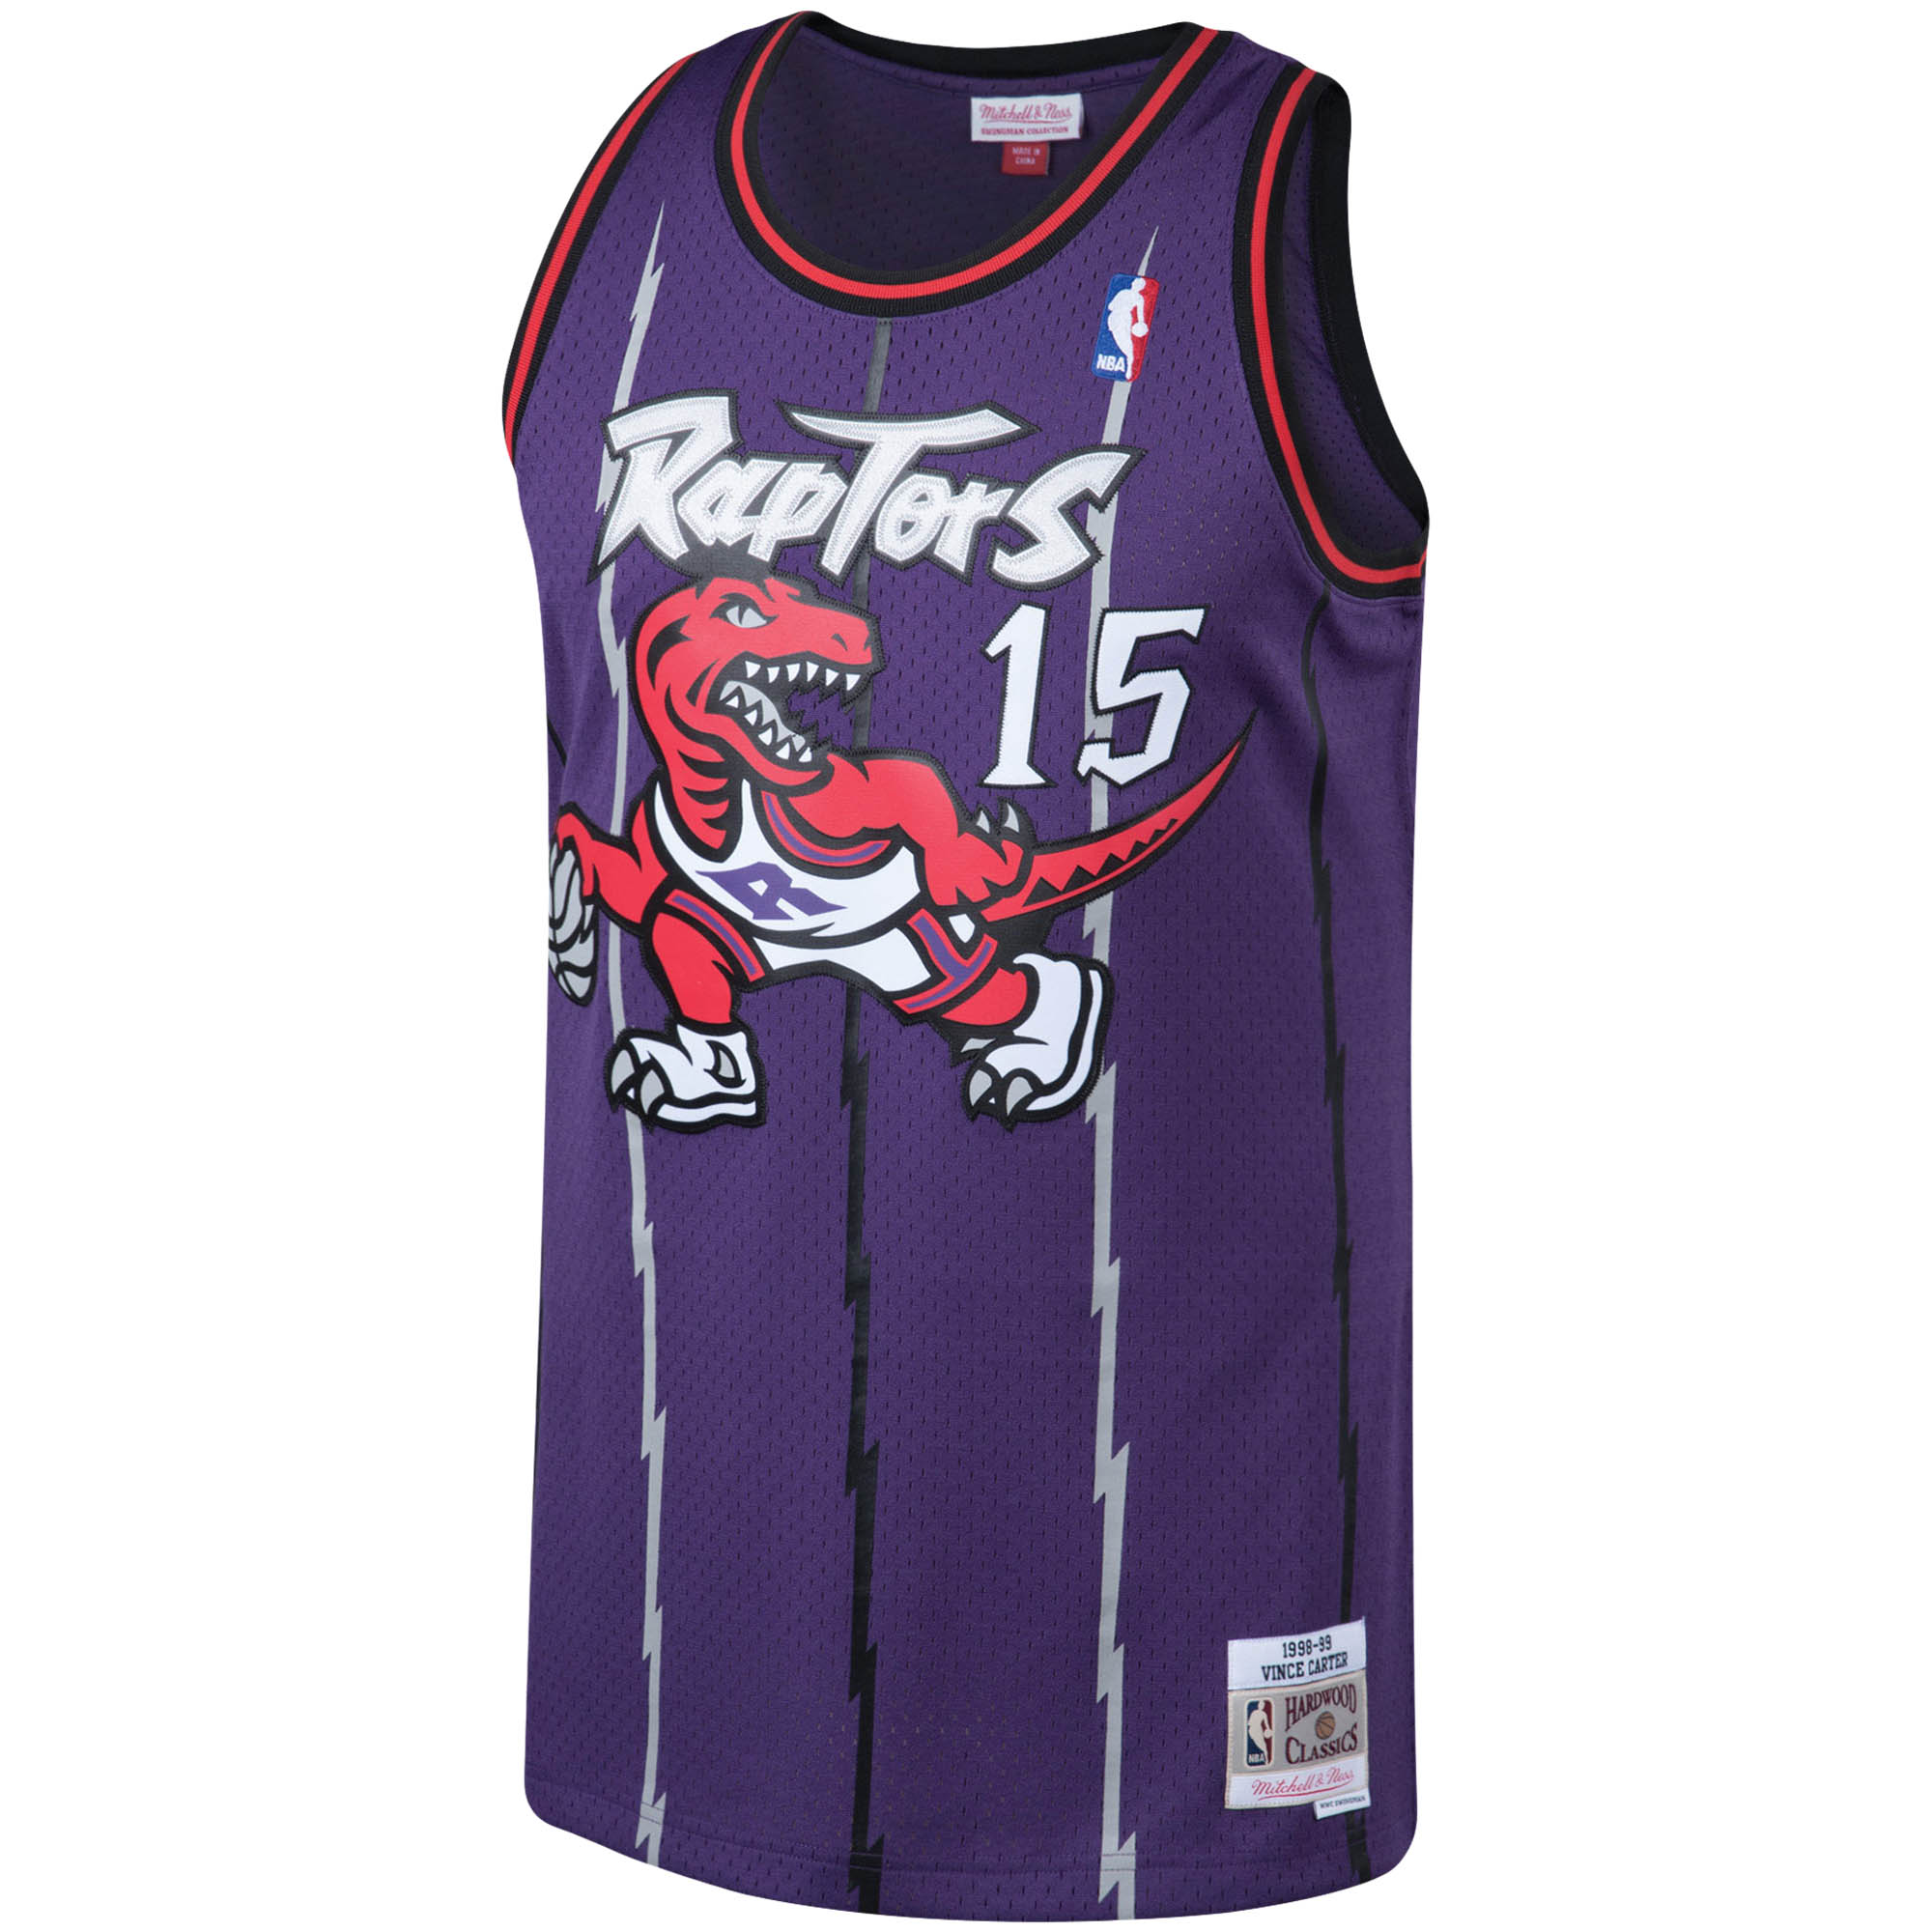 5e4db0051a8 Vince Carter Toronto Raptors Mitchell   Ness Big   Tall Hardwood Classics  Jersey - Purple - Walmart.com